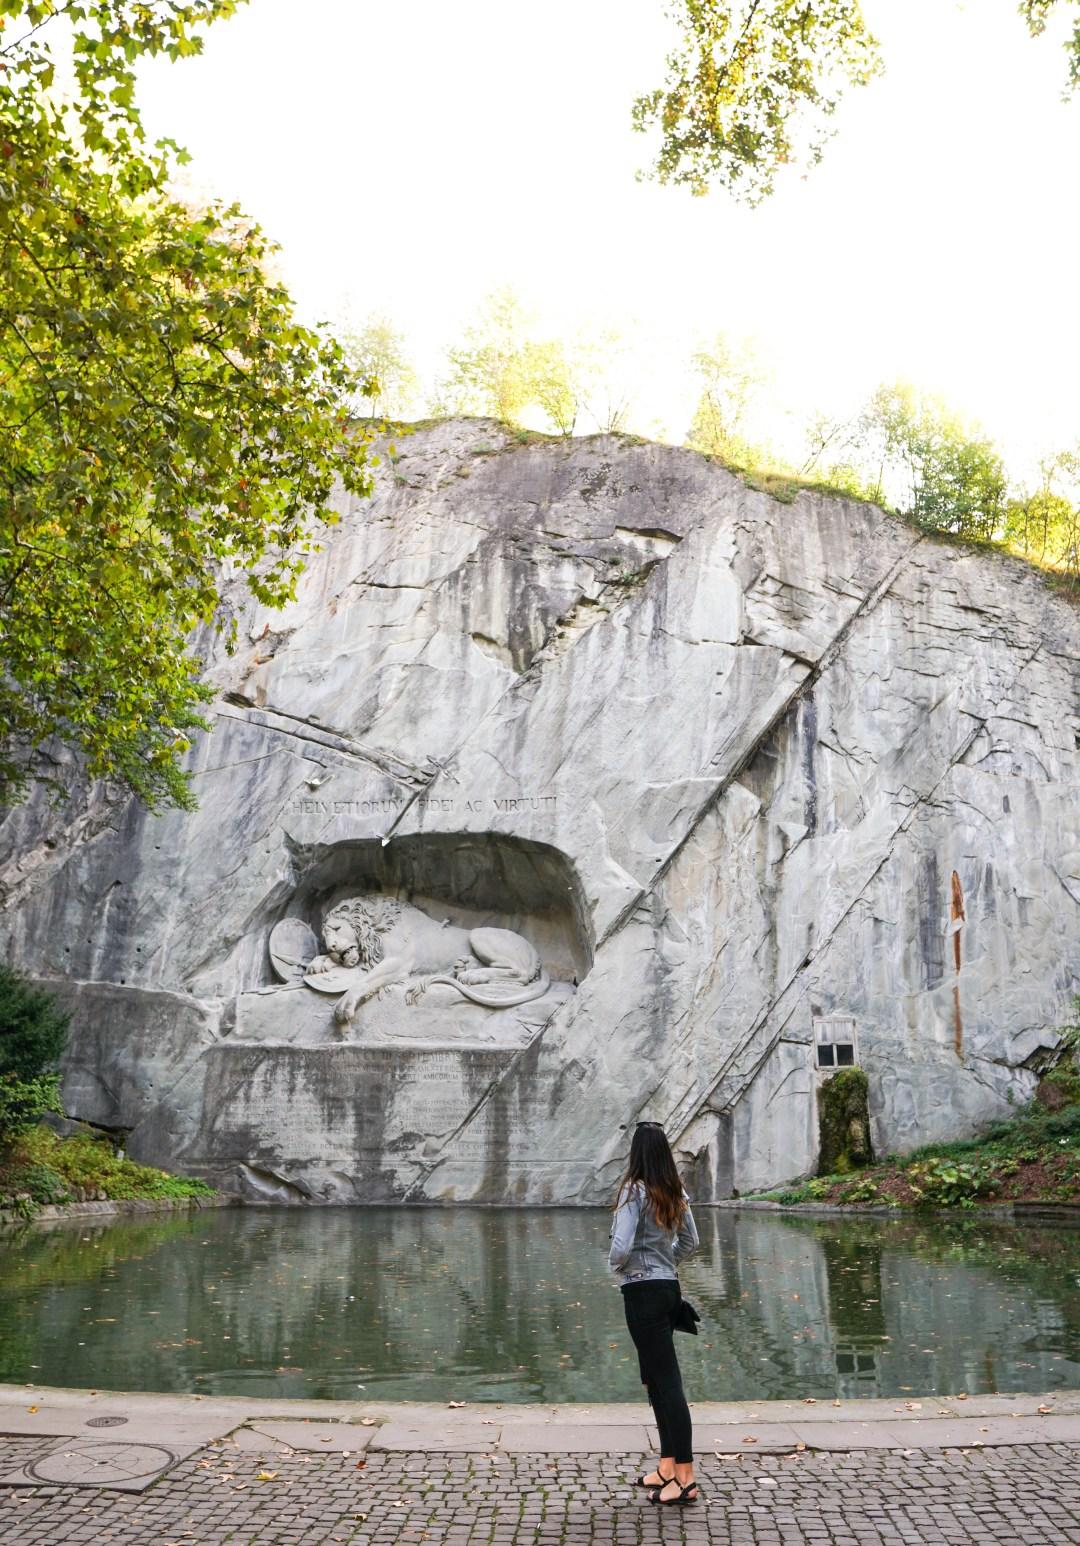 Lion of Lucerne, Lion Monument, Lucerne Swizterland, things to do in Lucerne